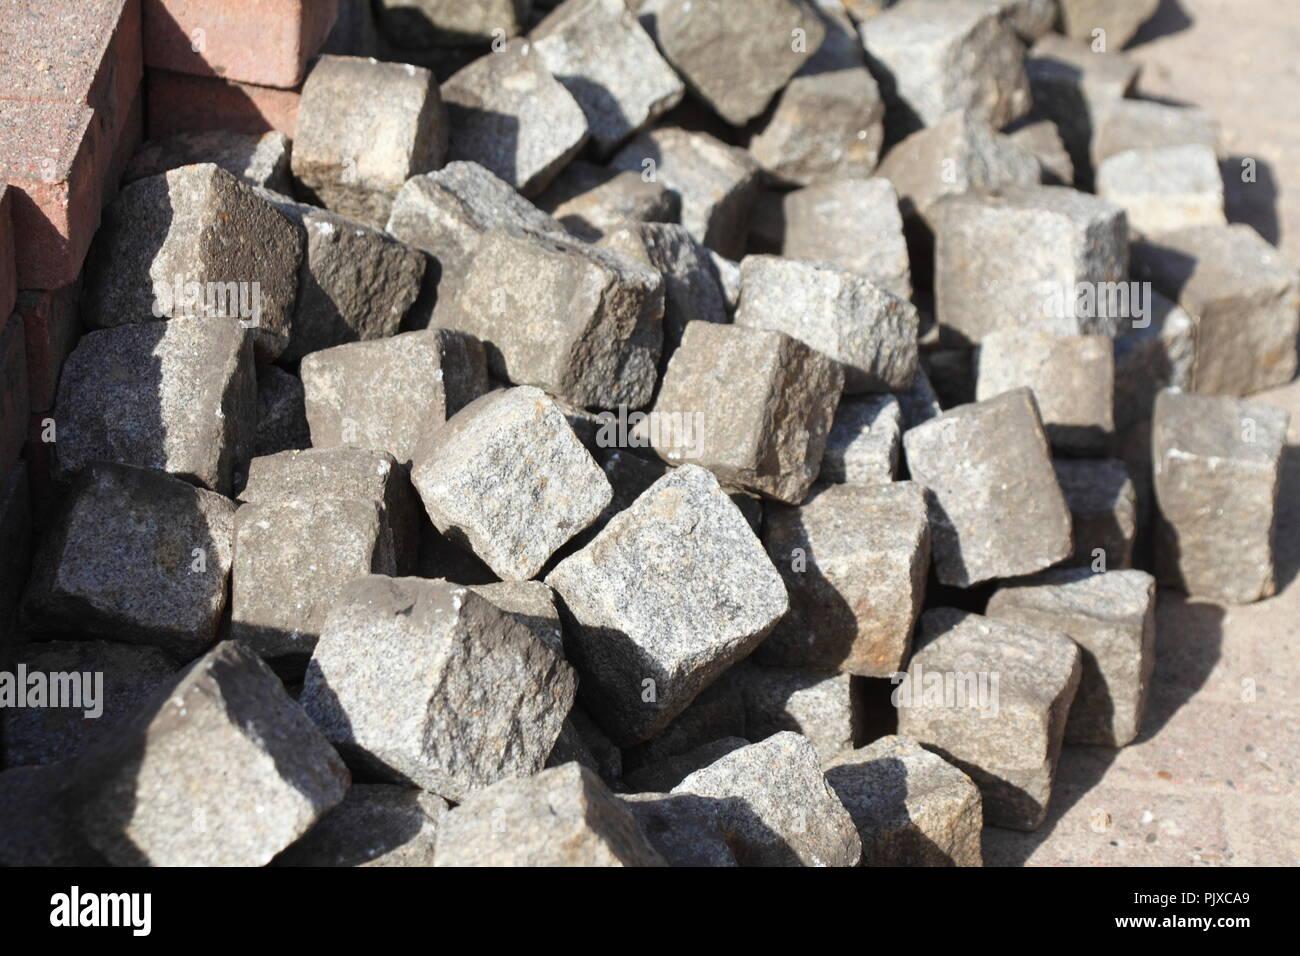 Paving stones, roadworks, background - Stock Image